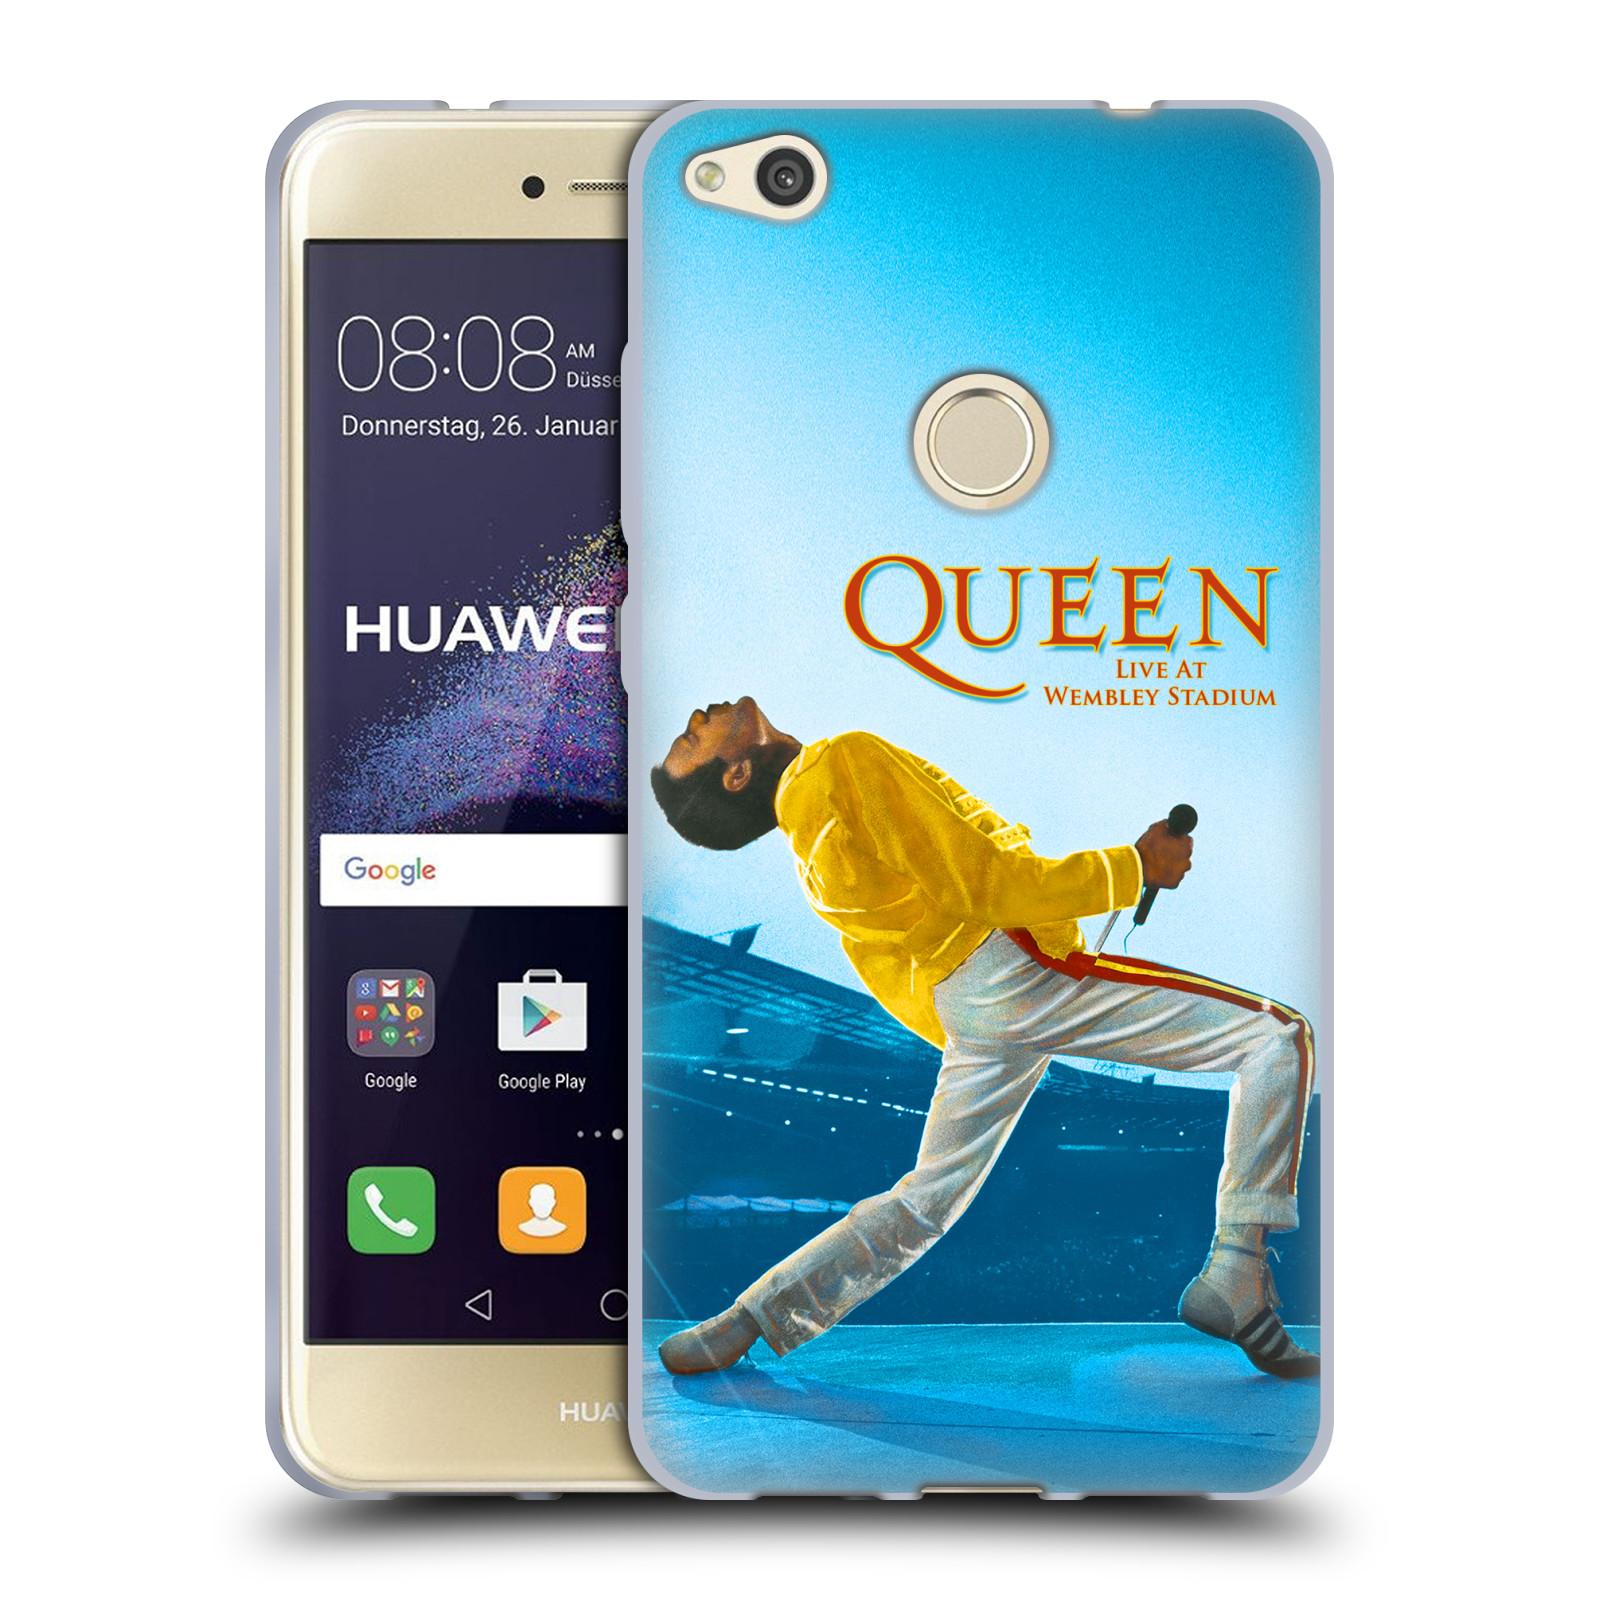 Silikonové pouzdro na mobil Huawei P9 Lite (2017) HEAD CASE Queen - Freddie Mercury